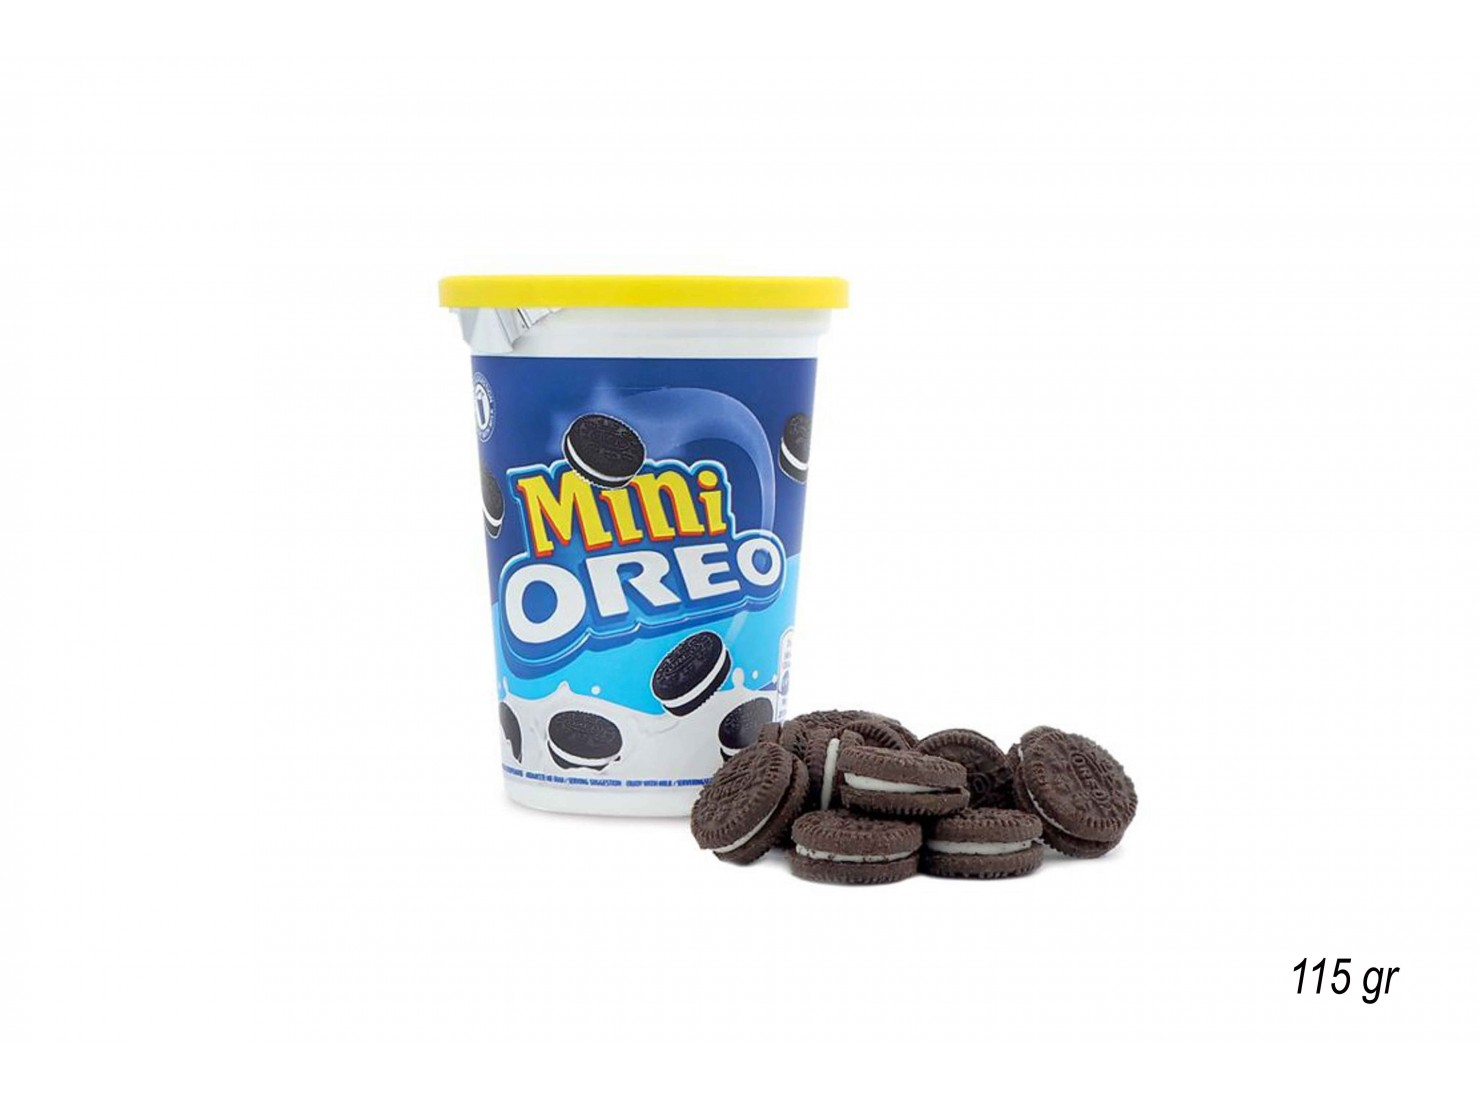 OREO COOKIES MINI 115 GR